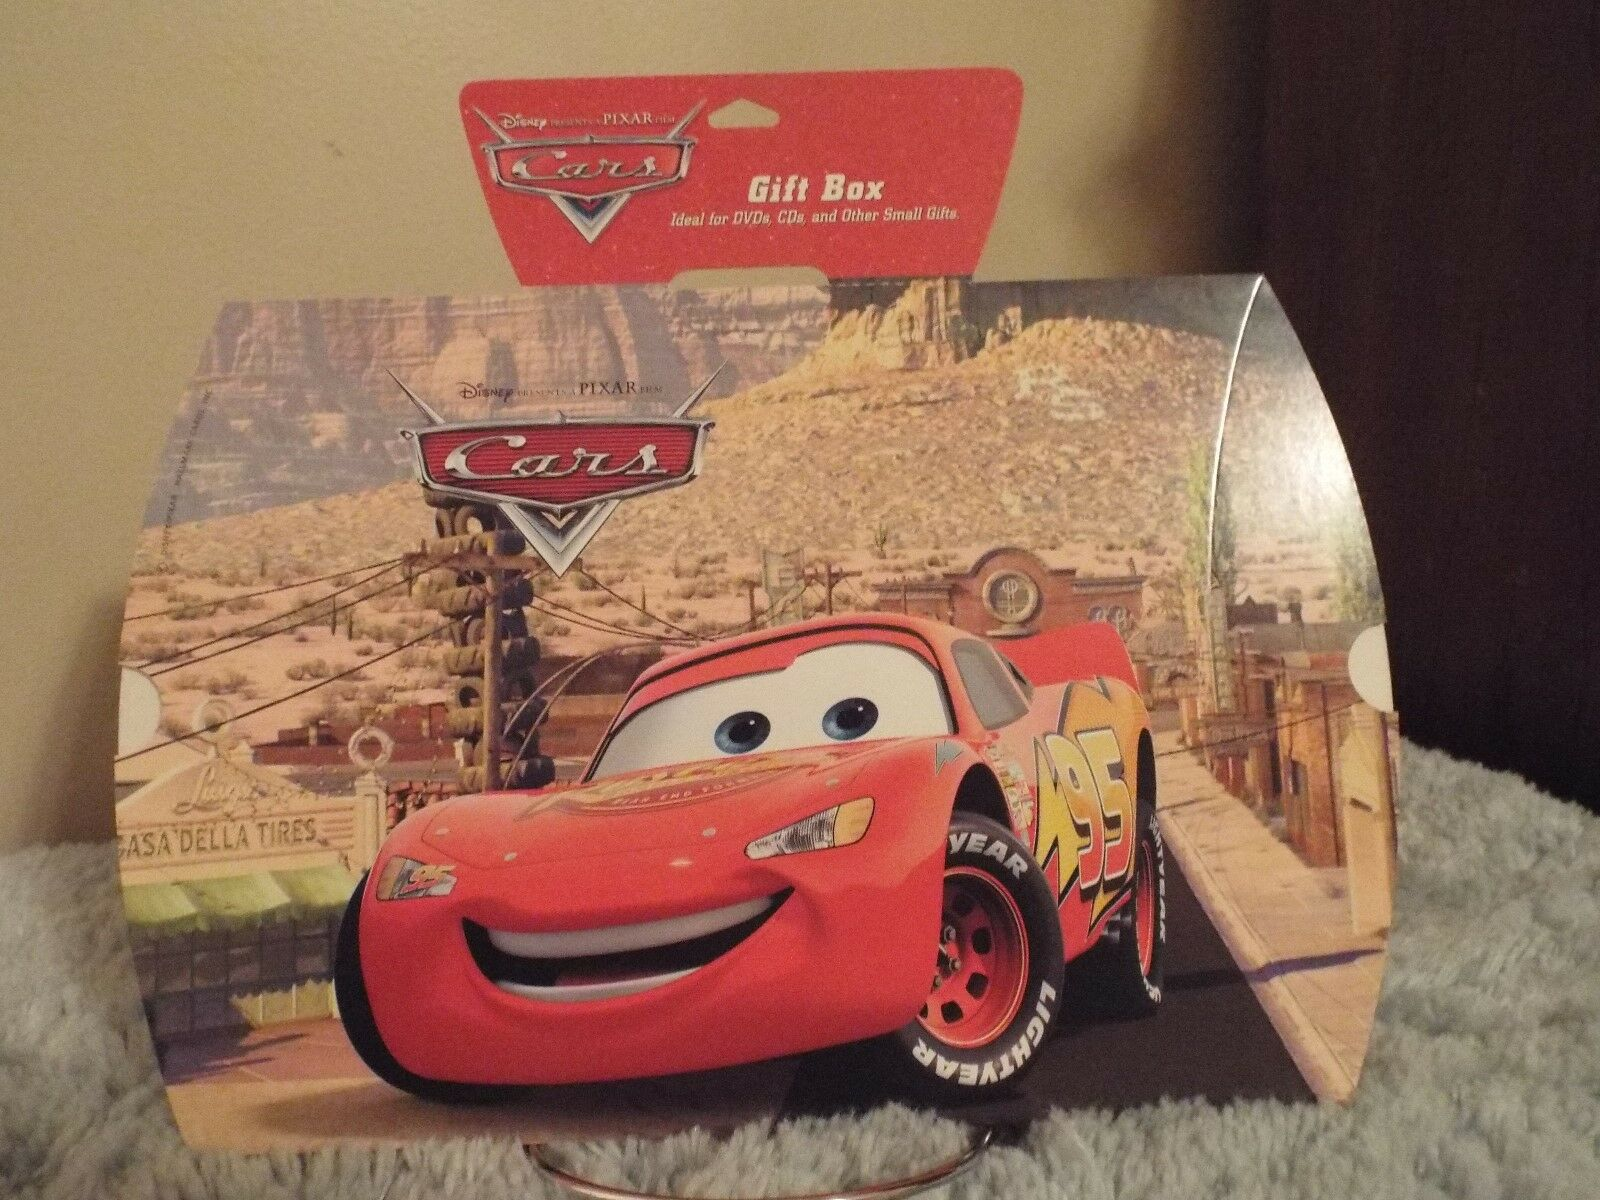 Disney Pixar Cars Gift Box